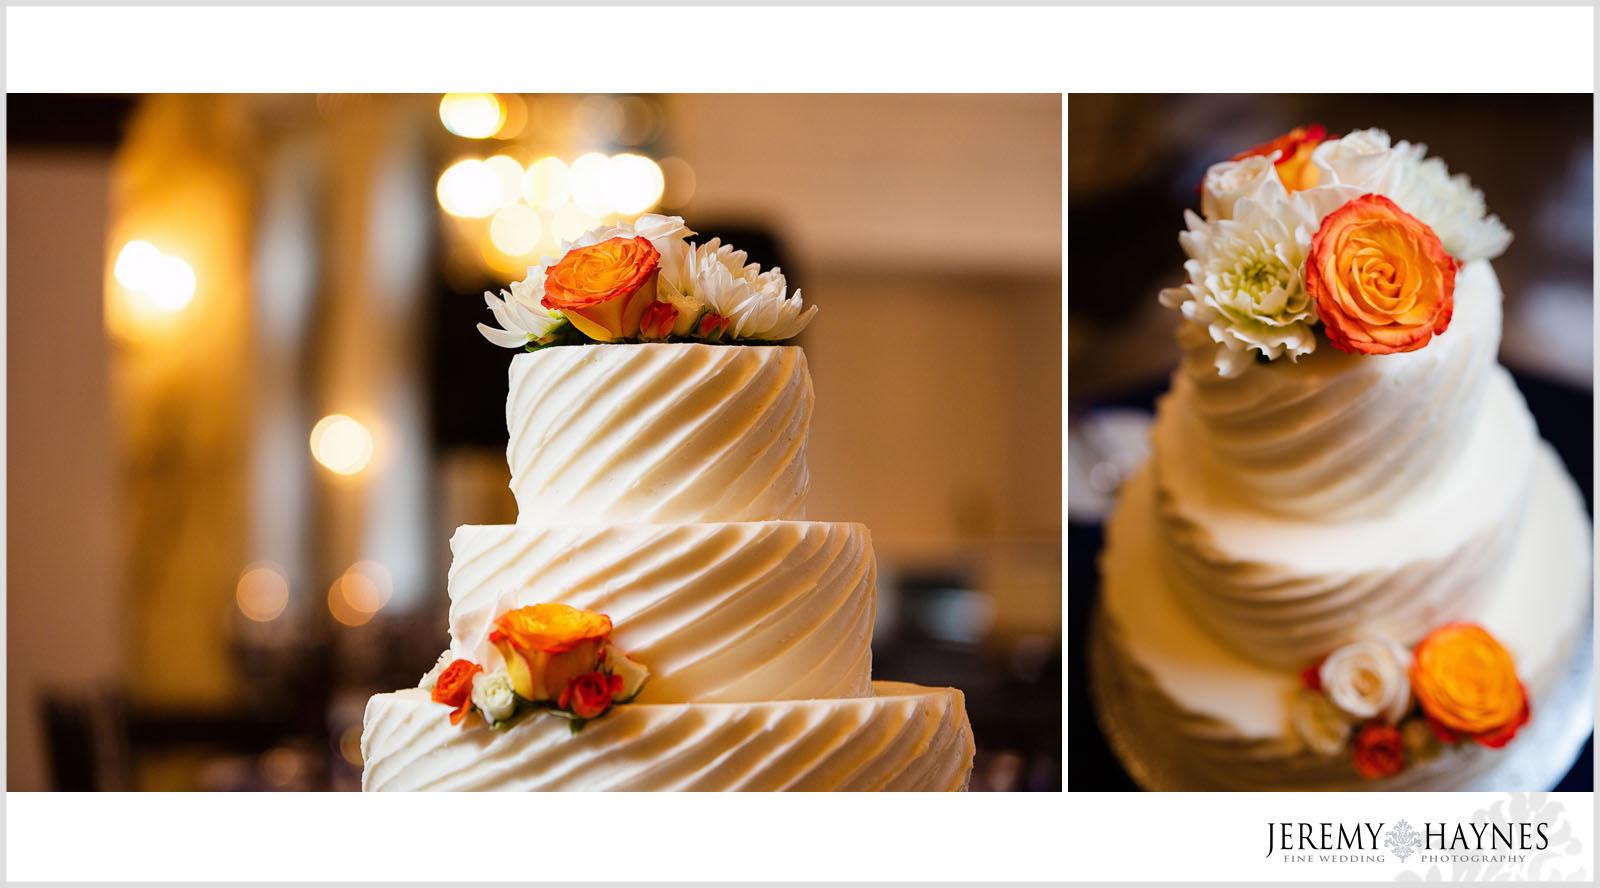 wedding-cake-jeremy-haynes-photography-pipers-at-the-marott-indianapolis-wedding.jpg